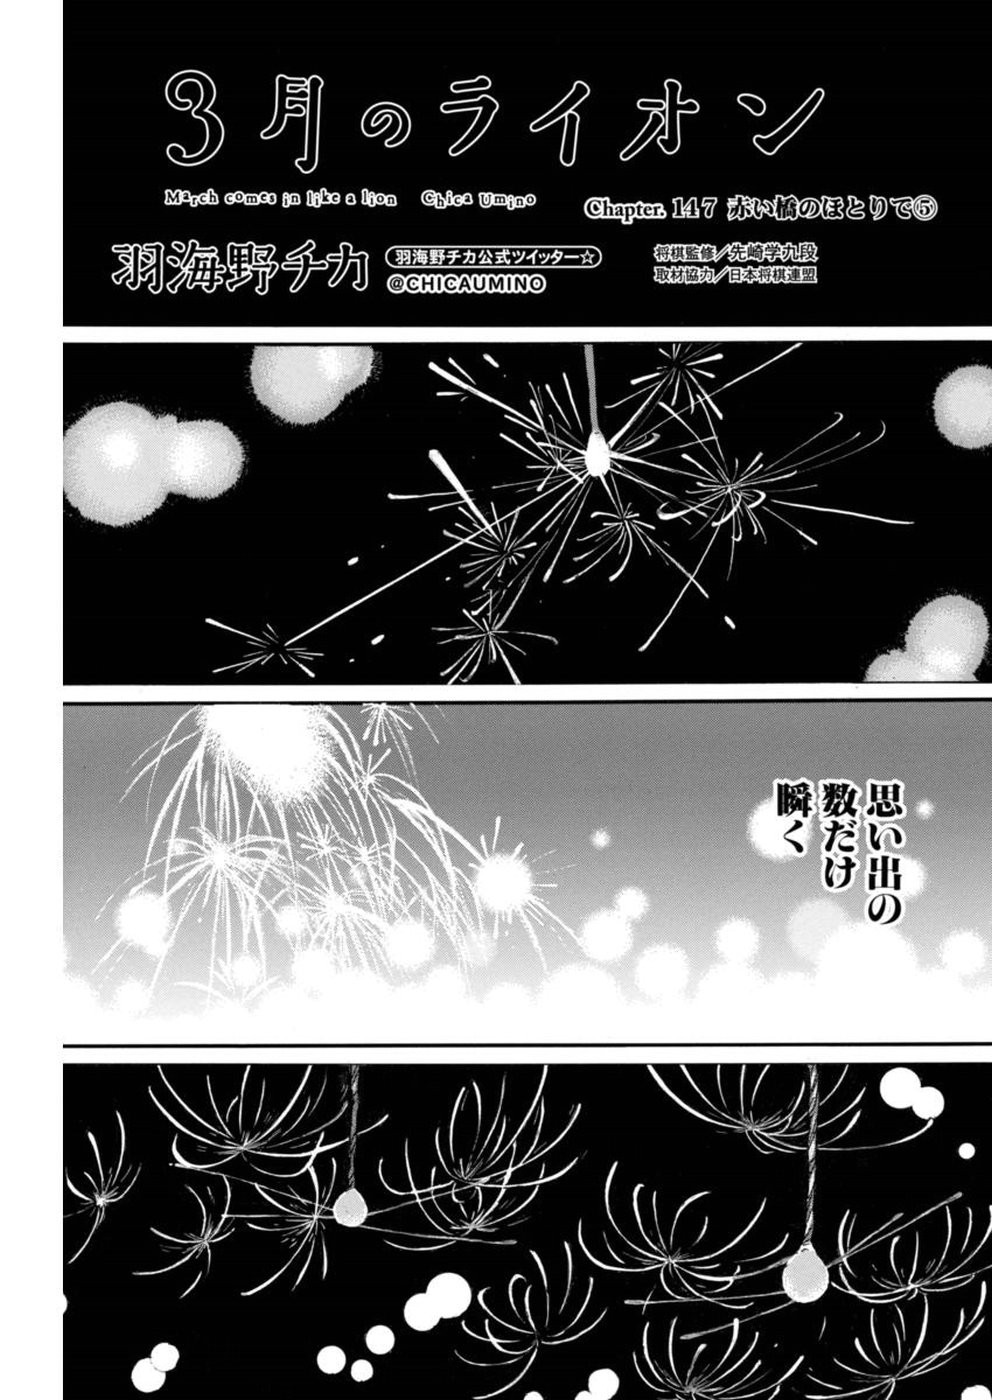 3 Gatsu no Lion - Chapter 147 - Page 1